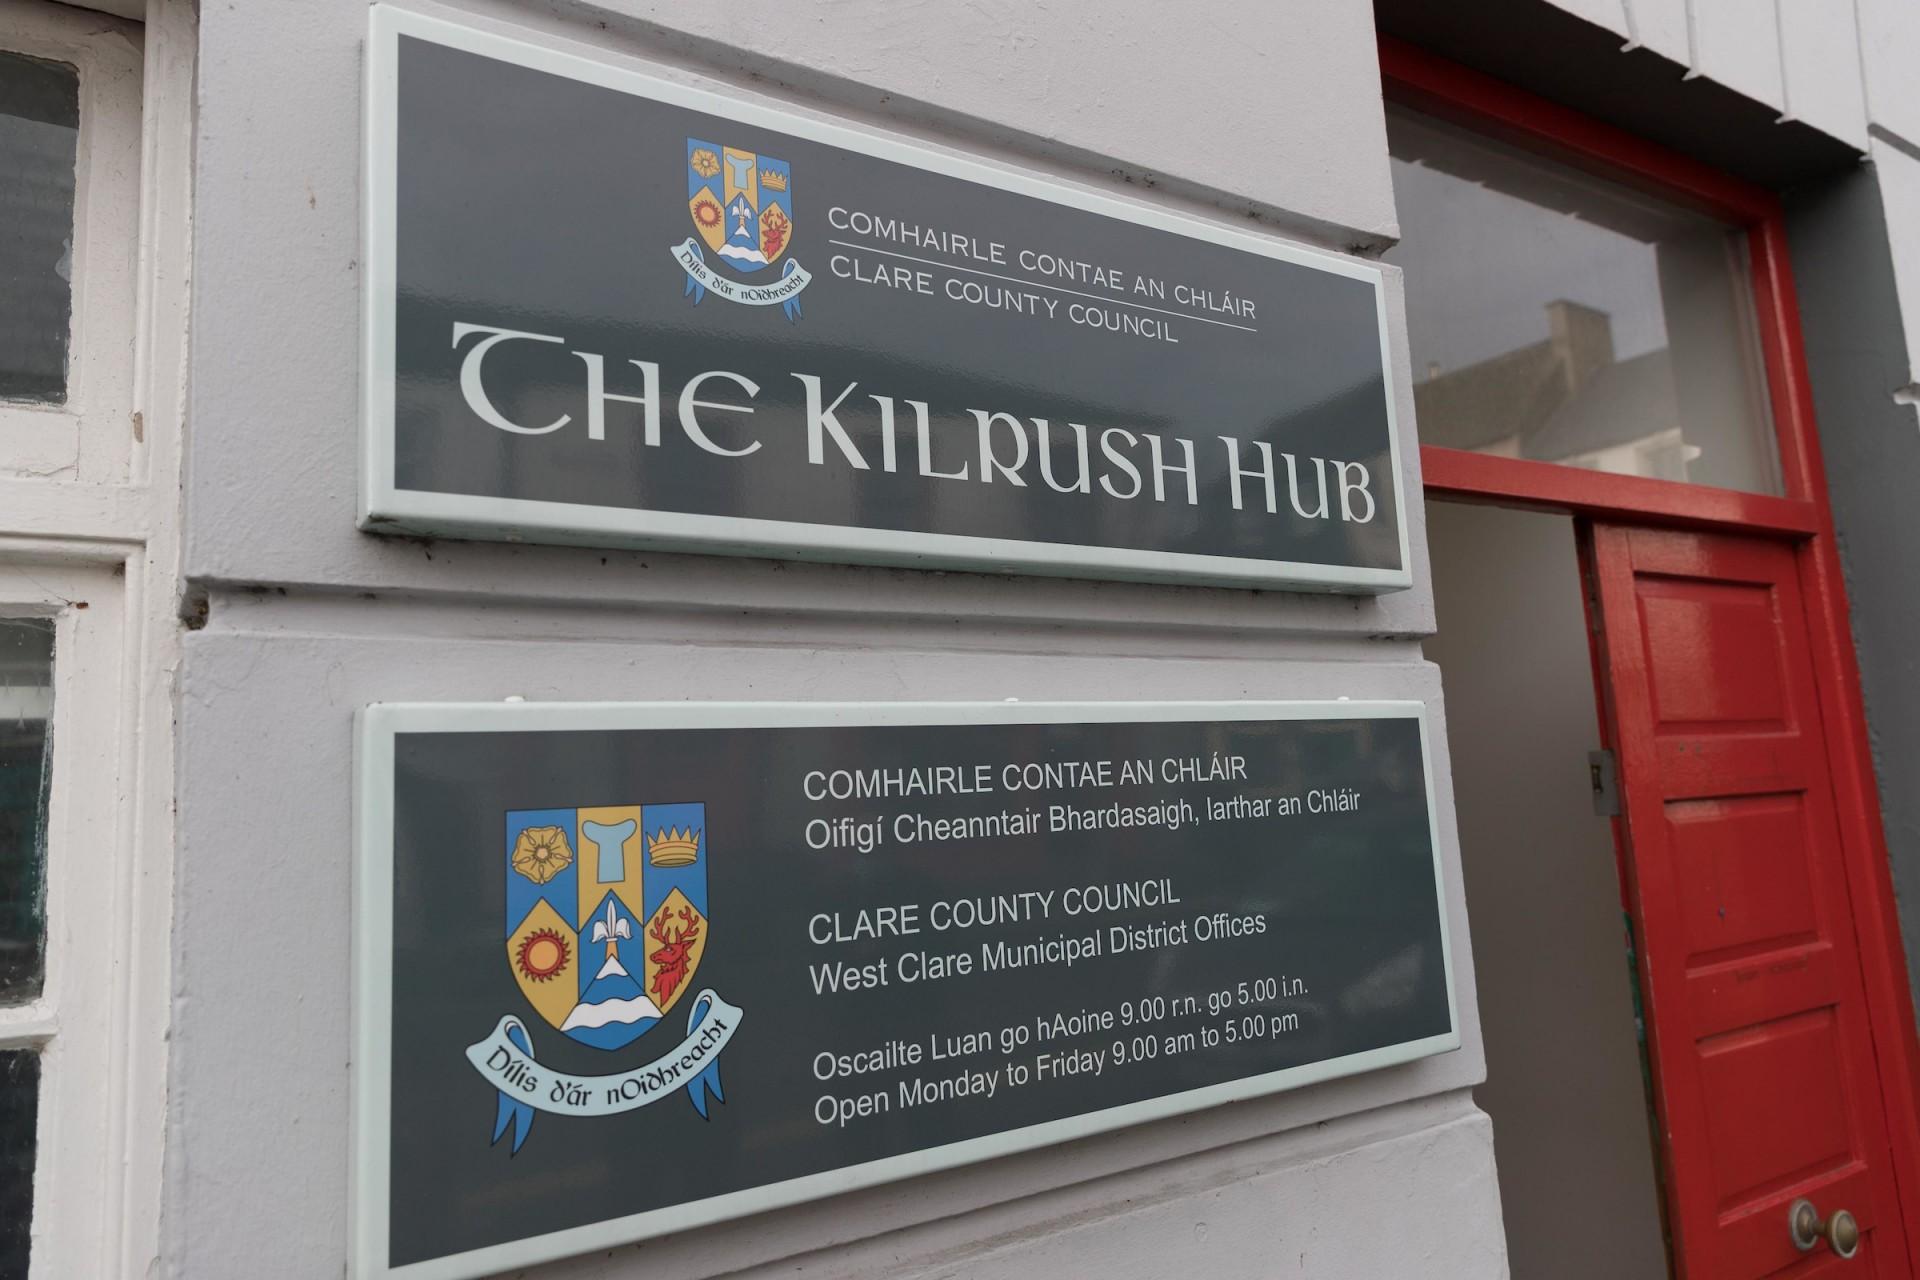 DigiClare - The Kilrush Hub